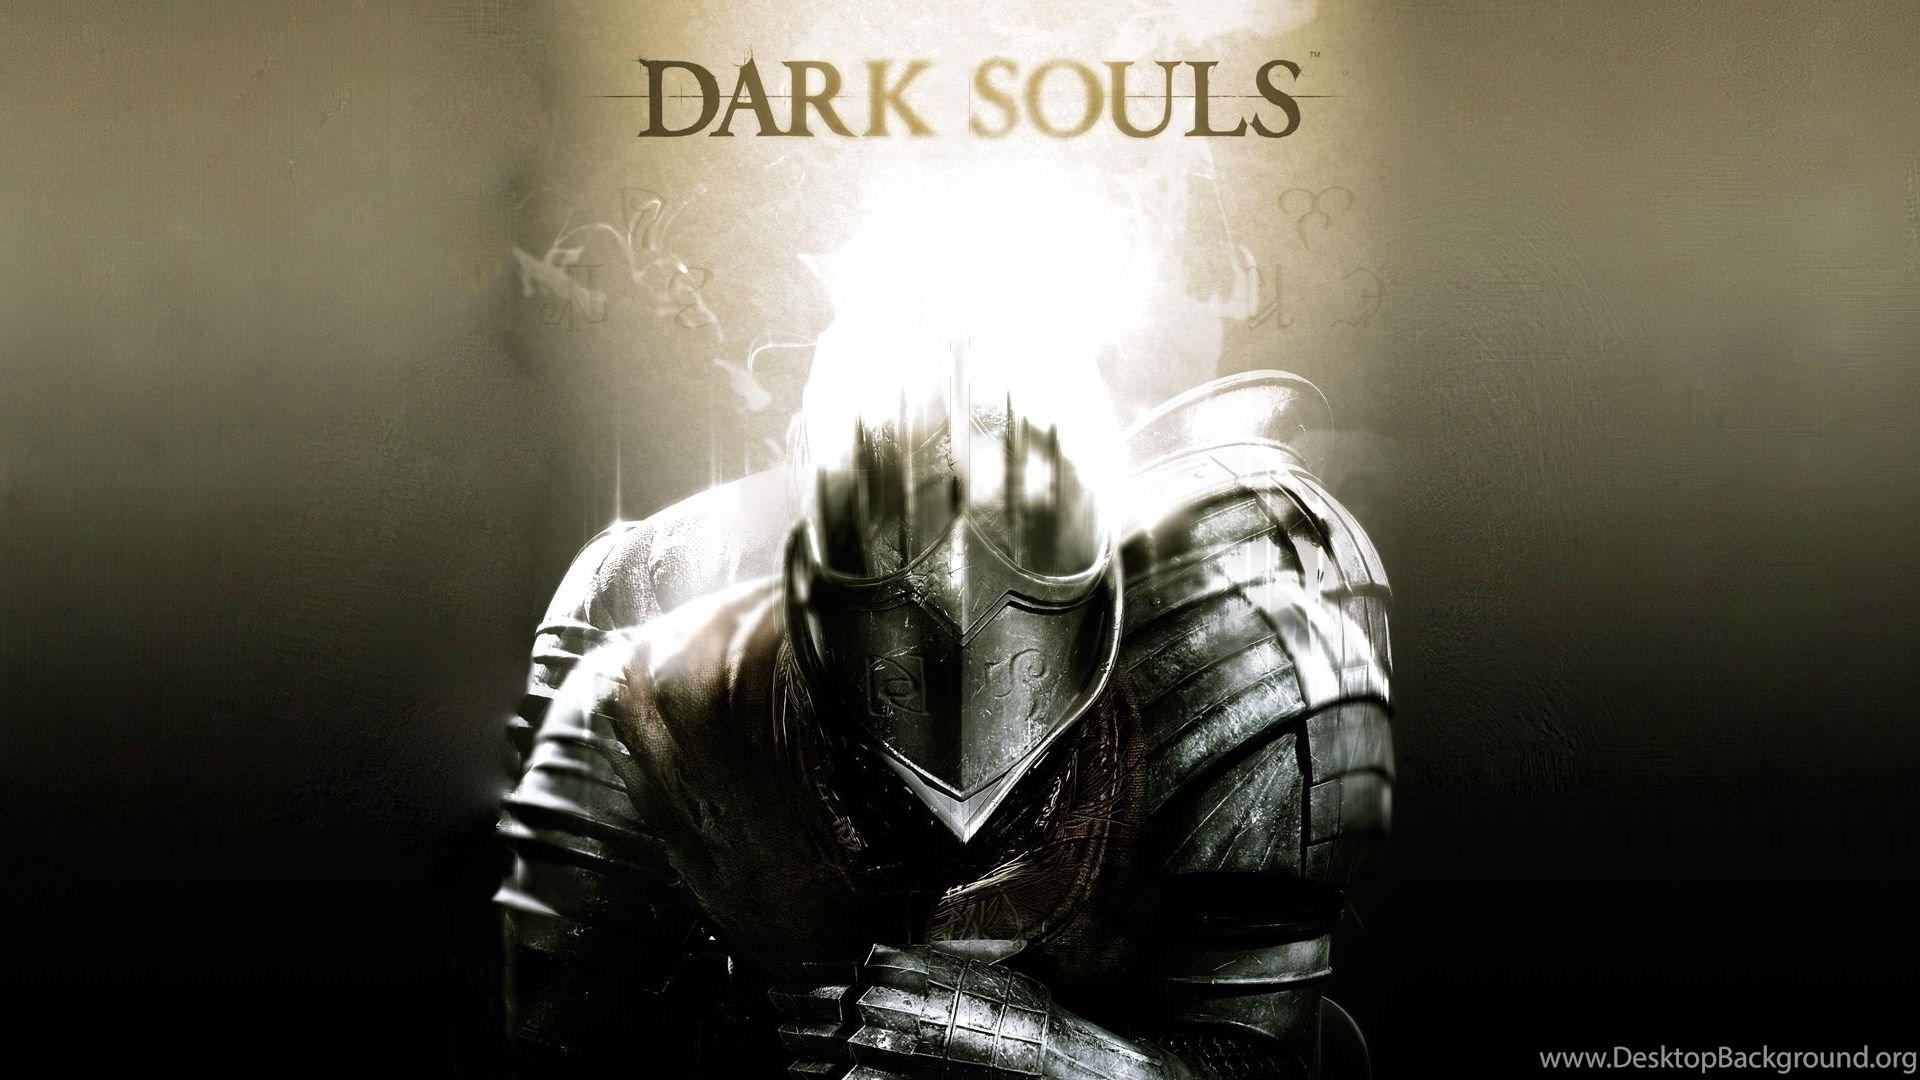 Full Hd 1080p Dark Souls Wallpapers Hd Desktop Backgrounds